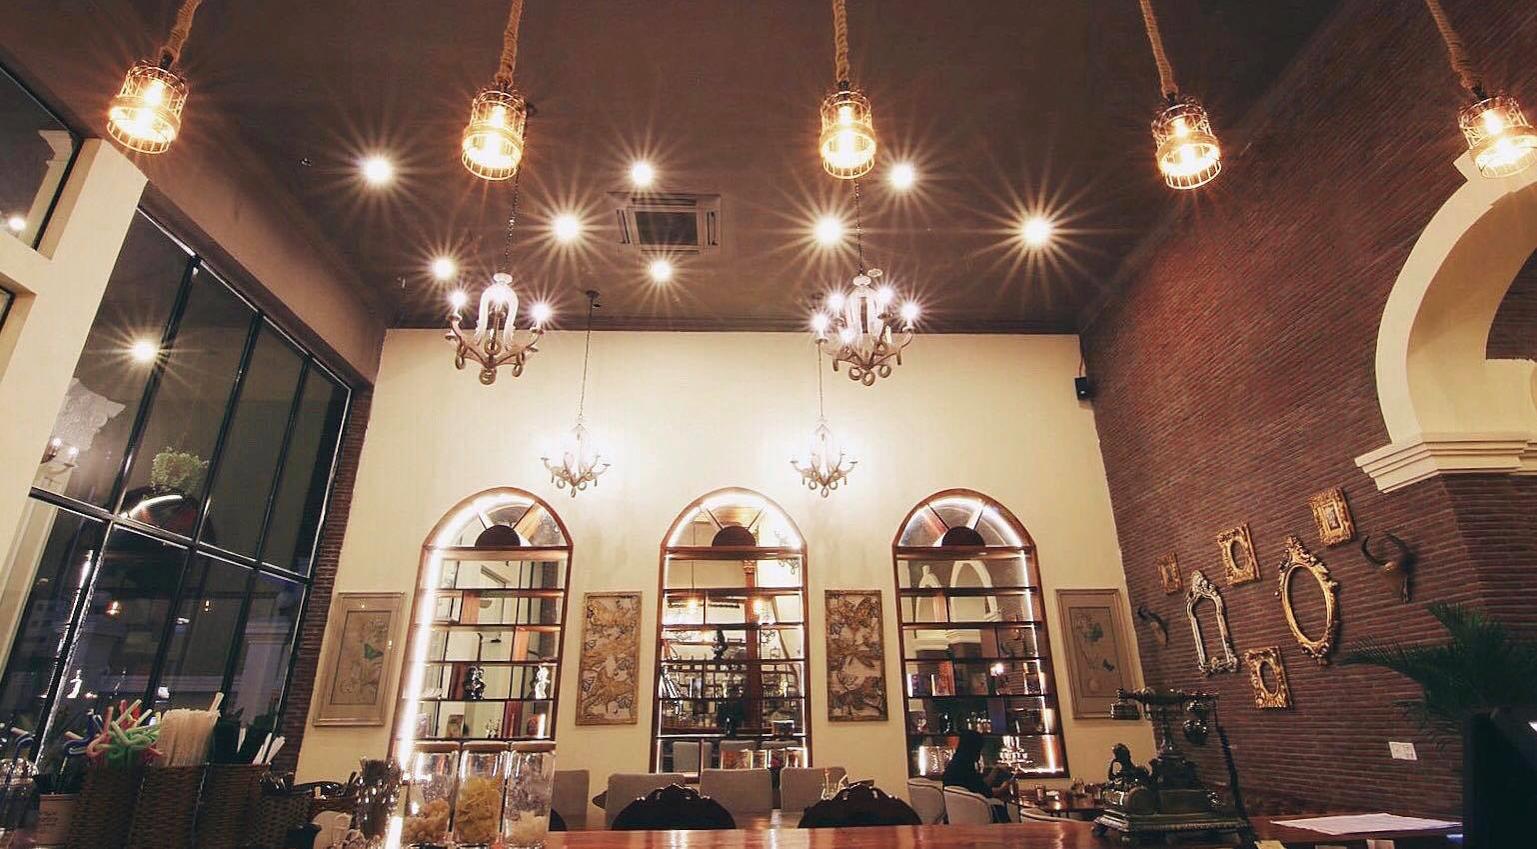 Luxuries Café ខាងក្នុងល្អប្រណីតដូចឈ្មោះមែន